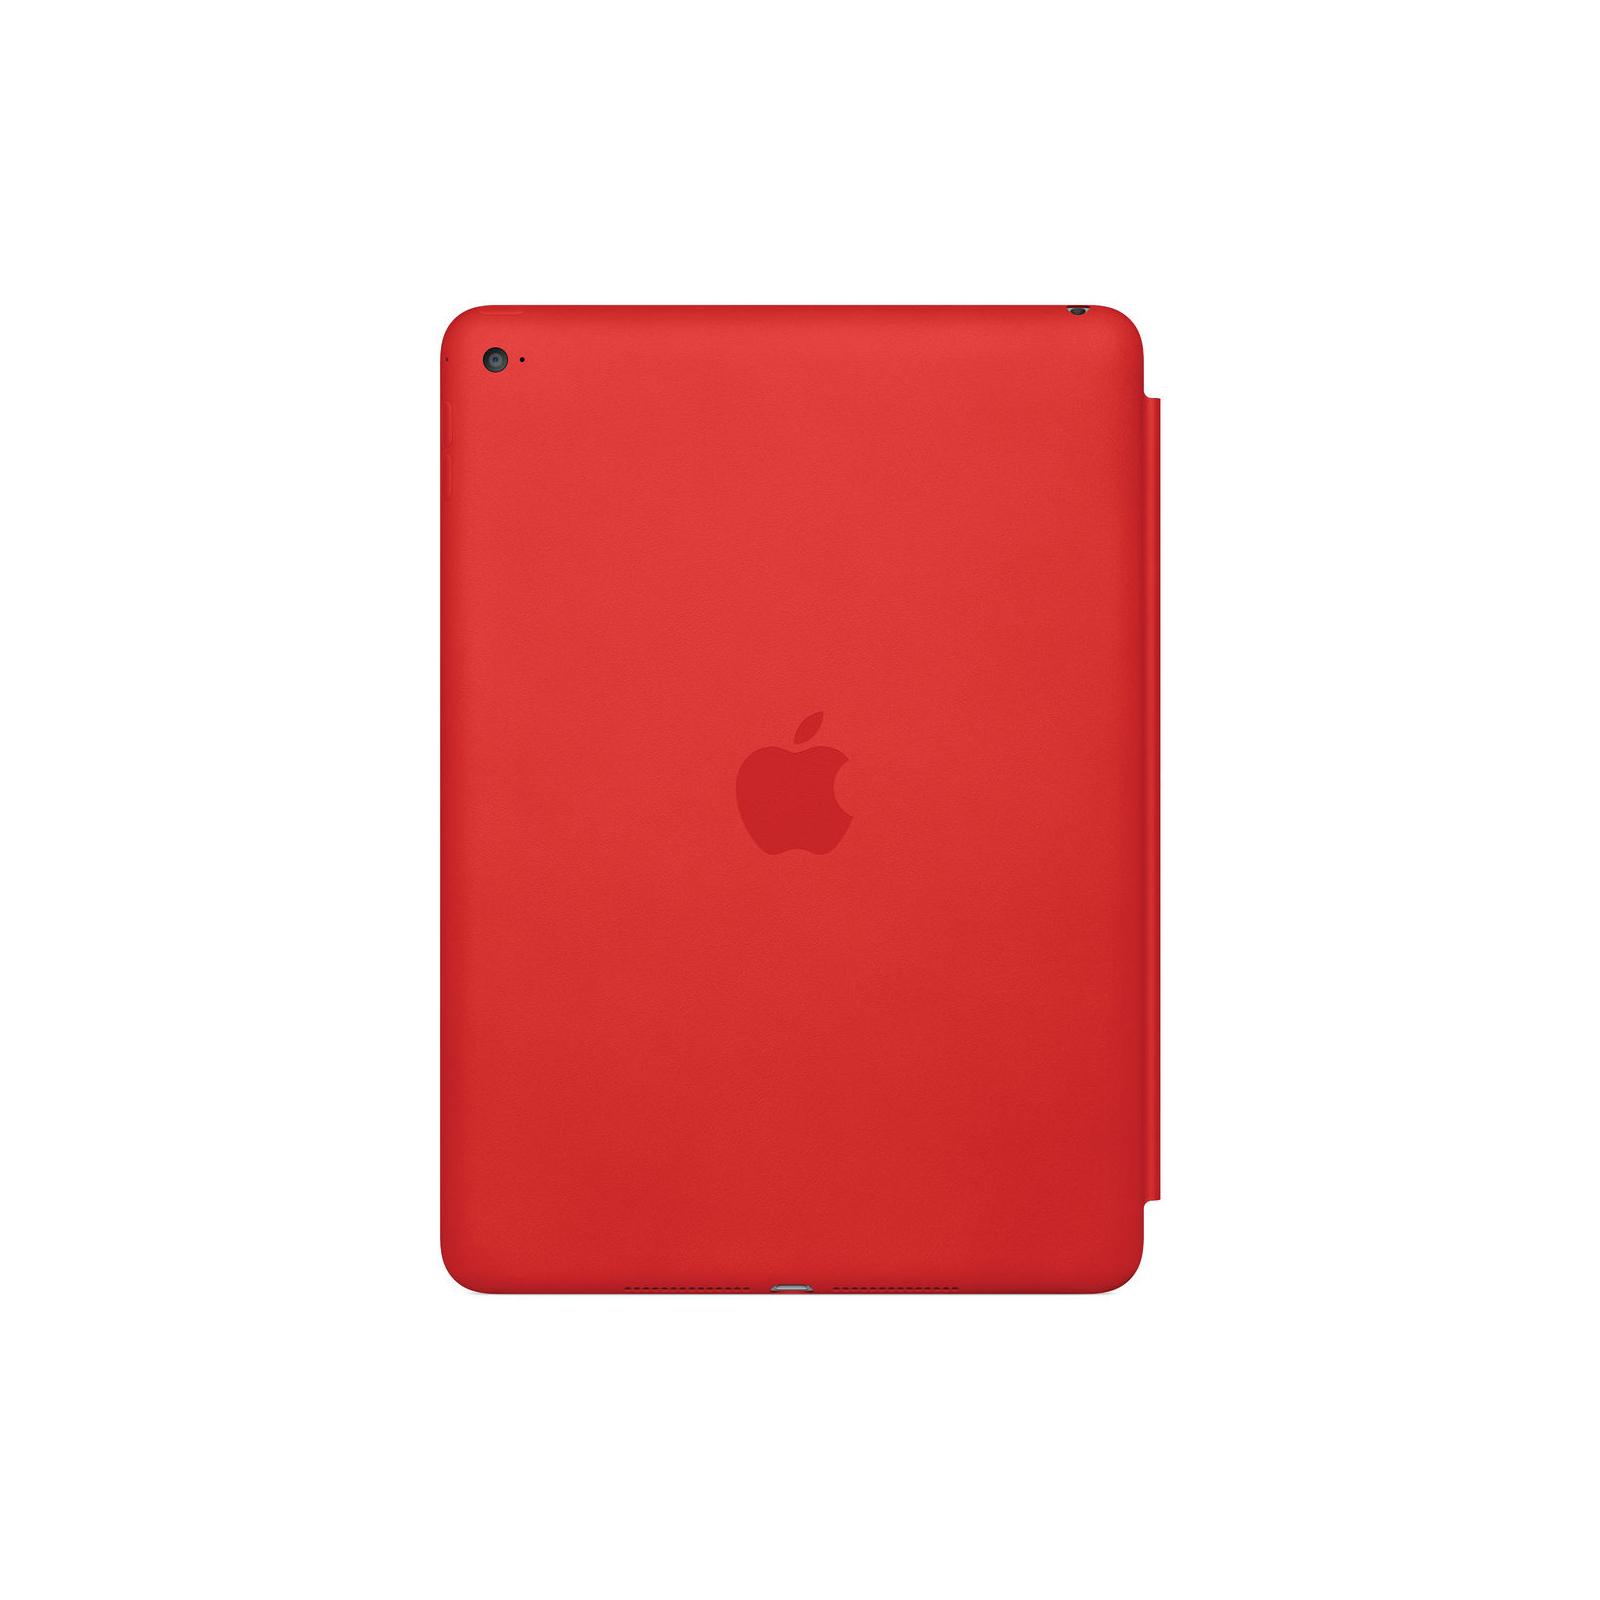 Чехол для планшета Apple Smart Case для iPad Air 2 (bright red) (MGTW2ZM/A) изображение 7